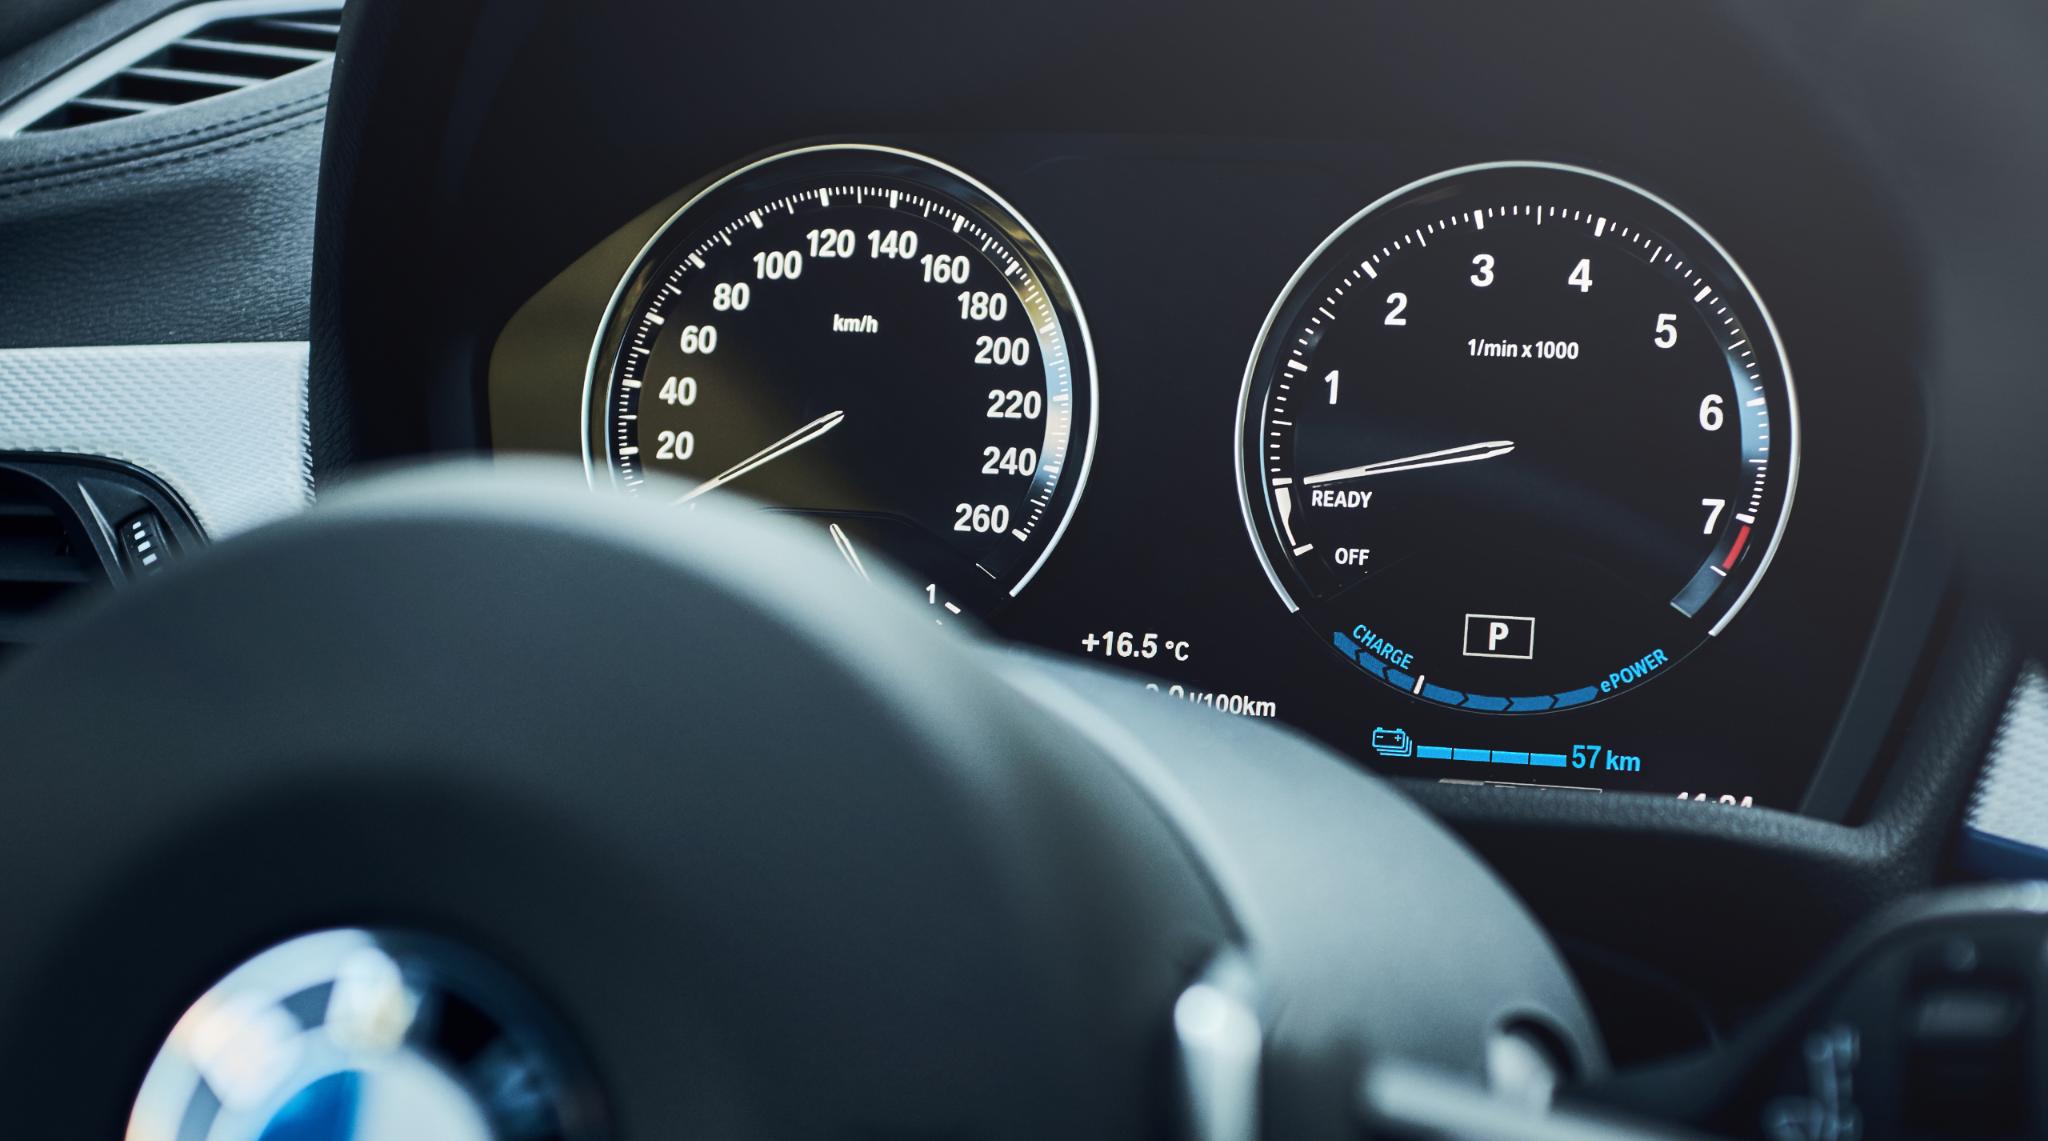 BMW X1 xDrive25e Display